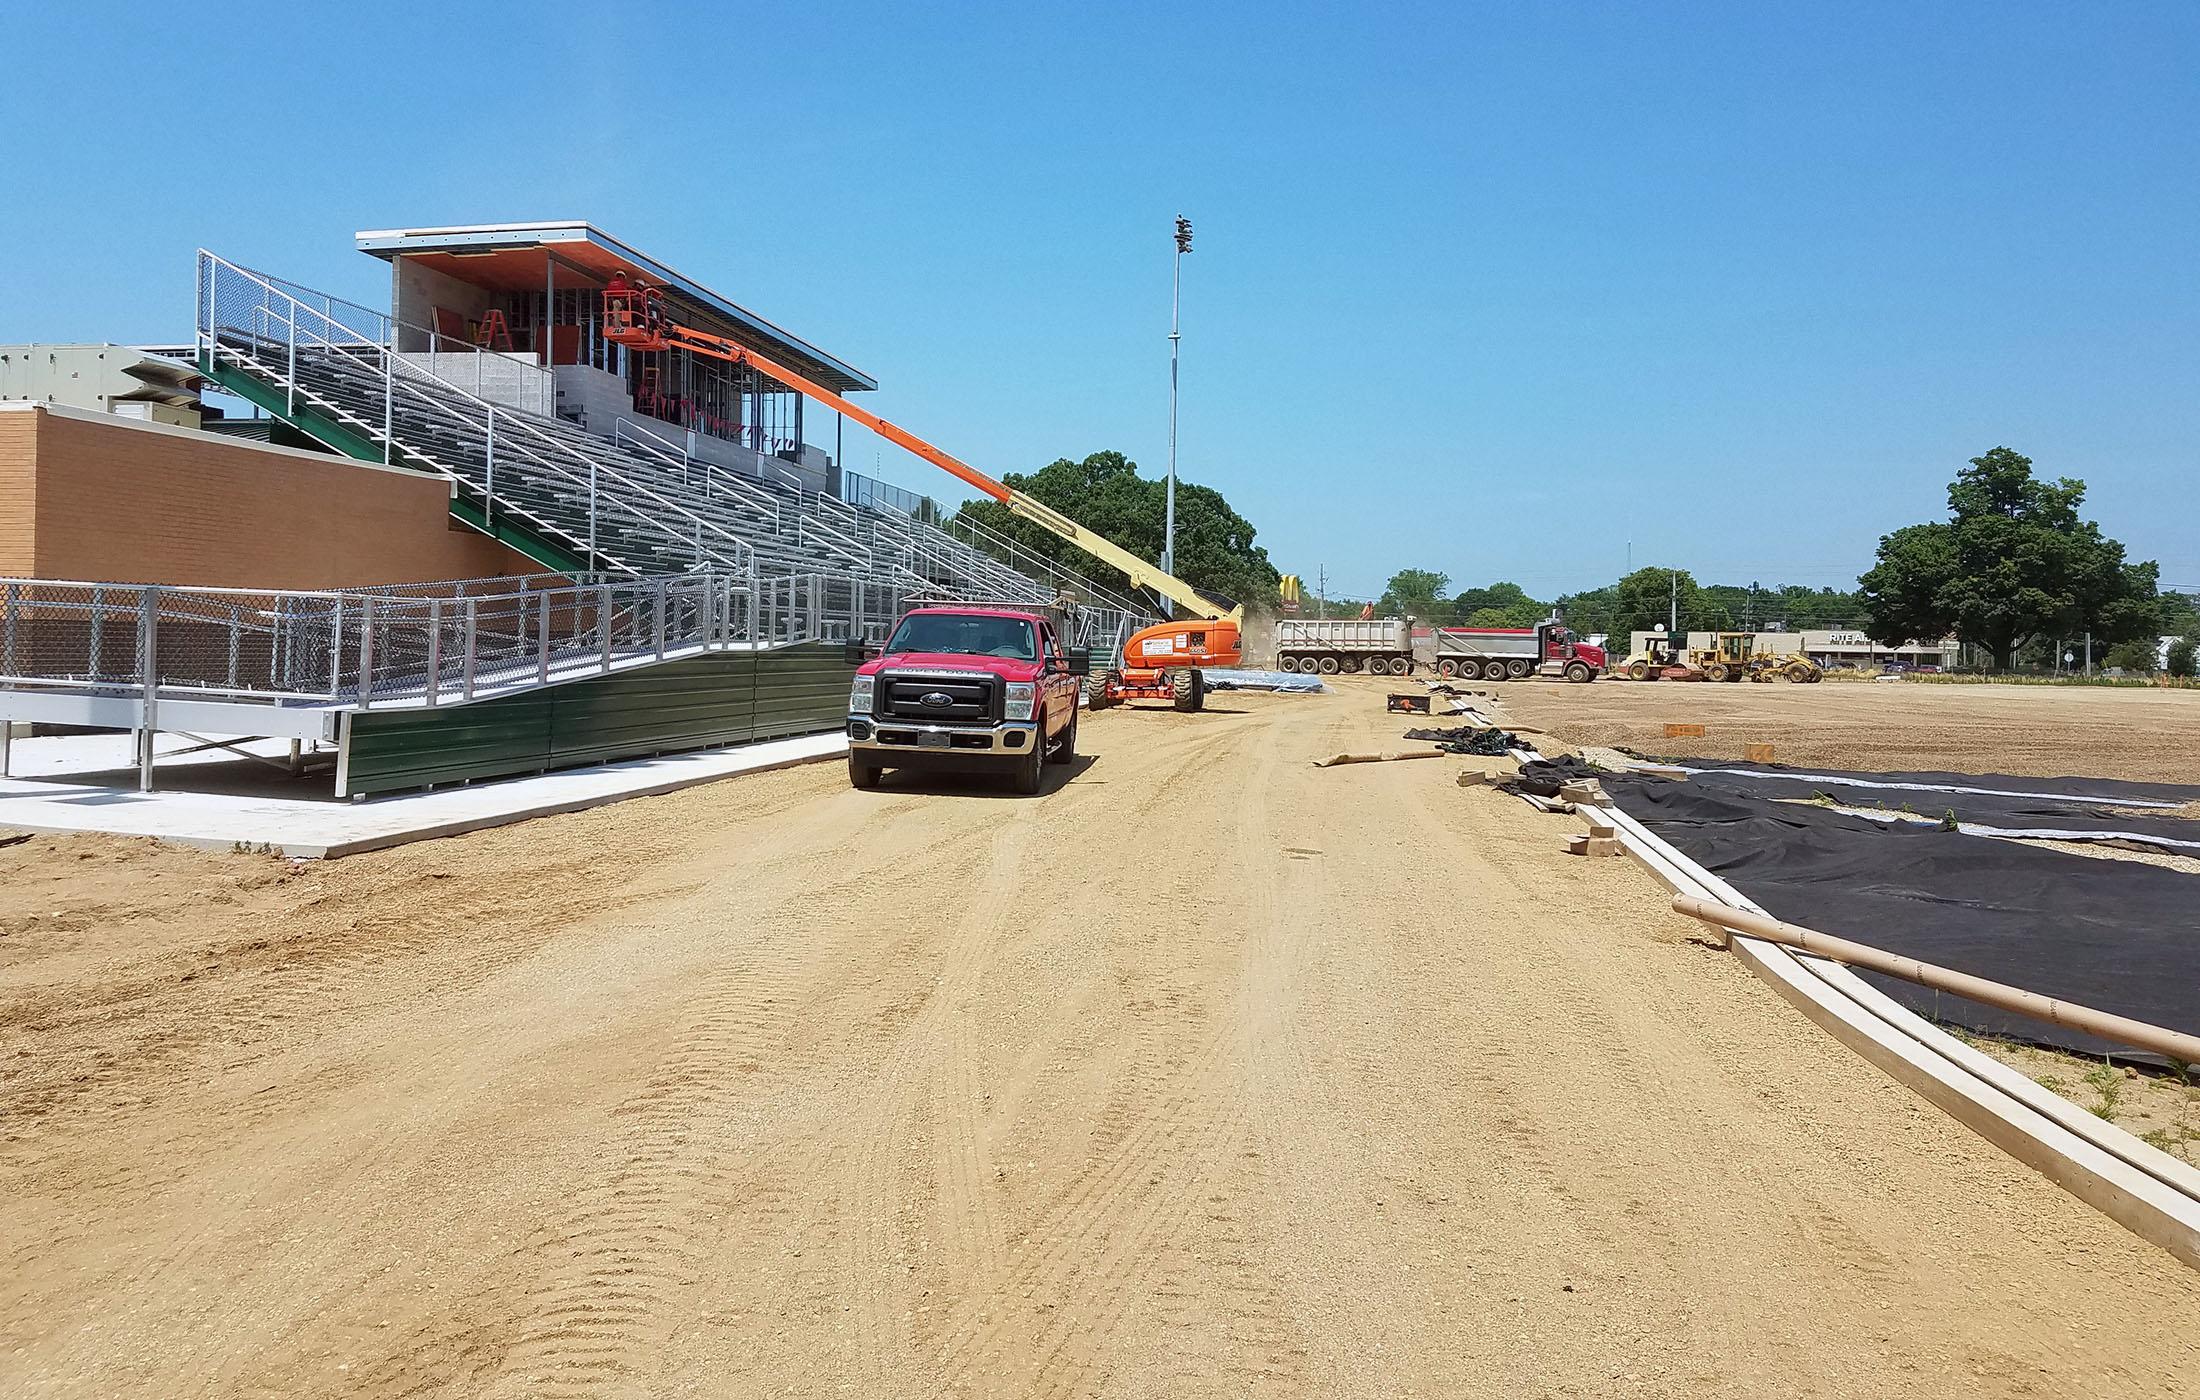 Sylvester Stadium Track Preparation Stadium Bleacher Construction